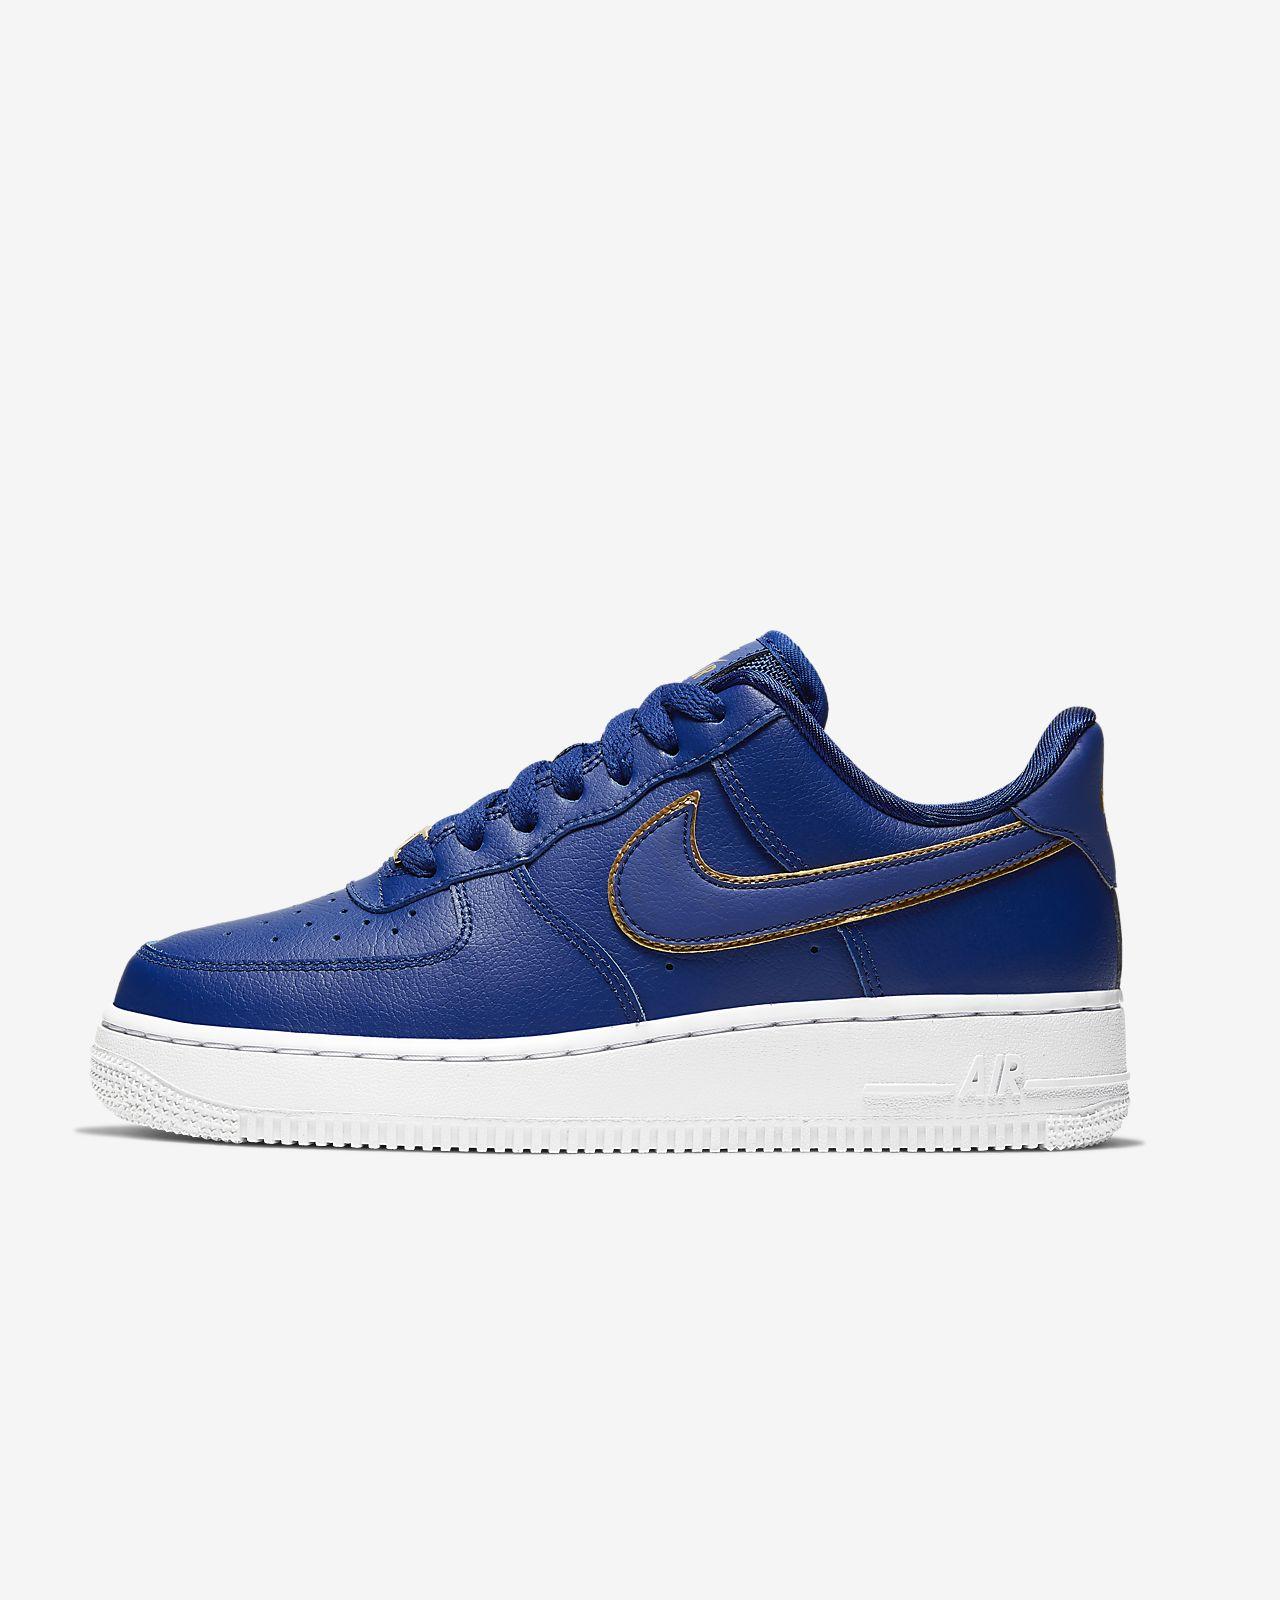 Nike Air Force 1 '07 ESS 女子运动鞋